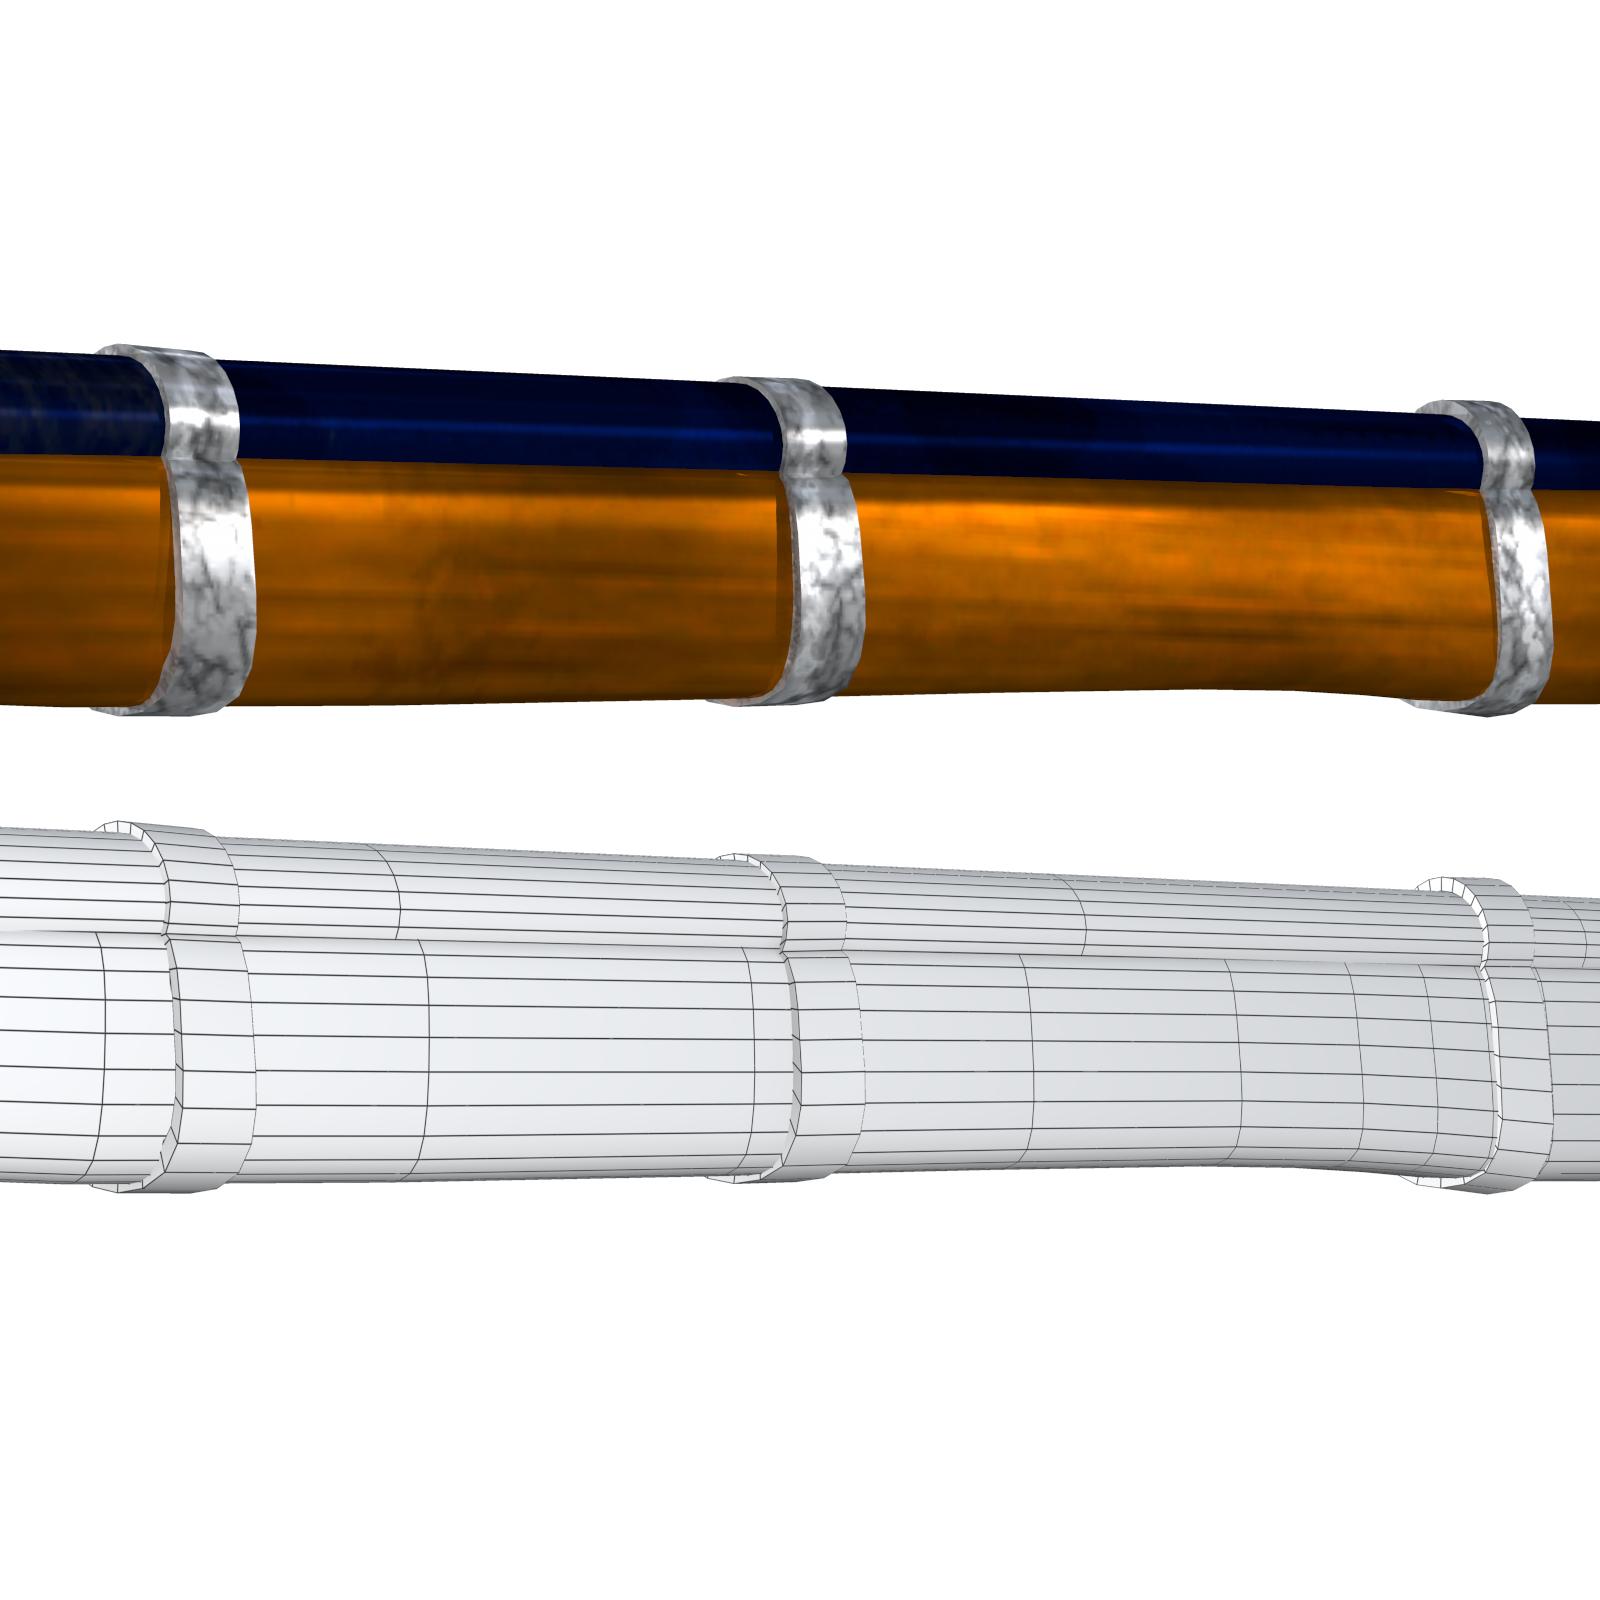 cap-n-ball rifle fbx obj 3d model fbx 220986